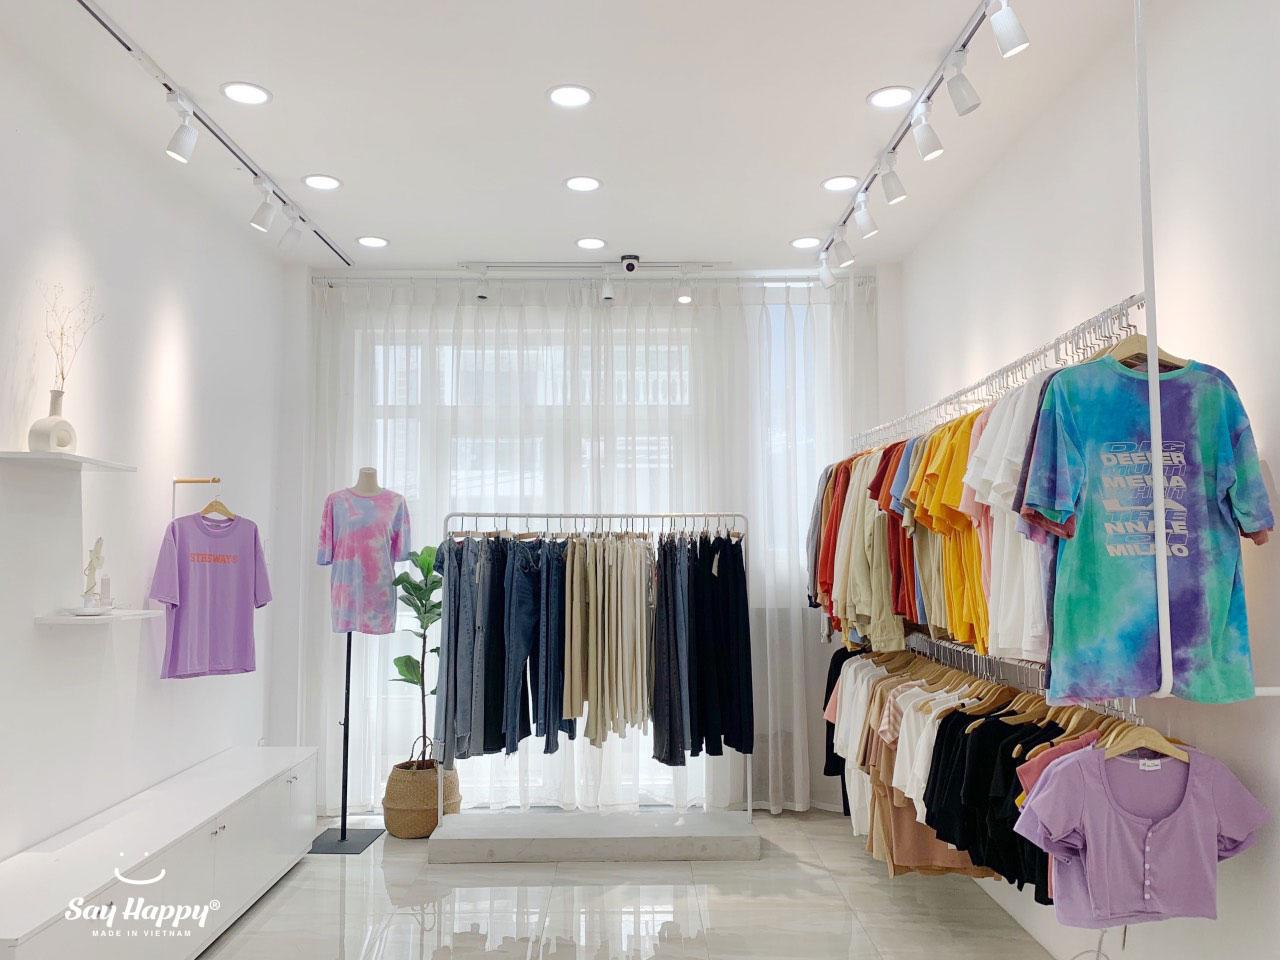 Cửa hàng áo thun say happy